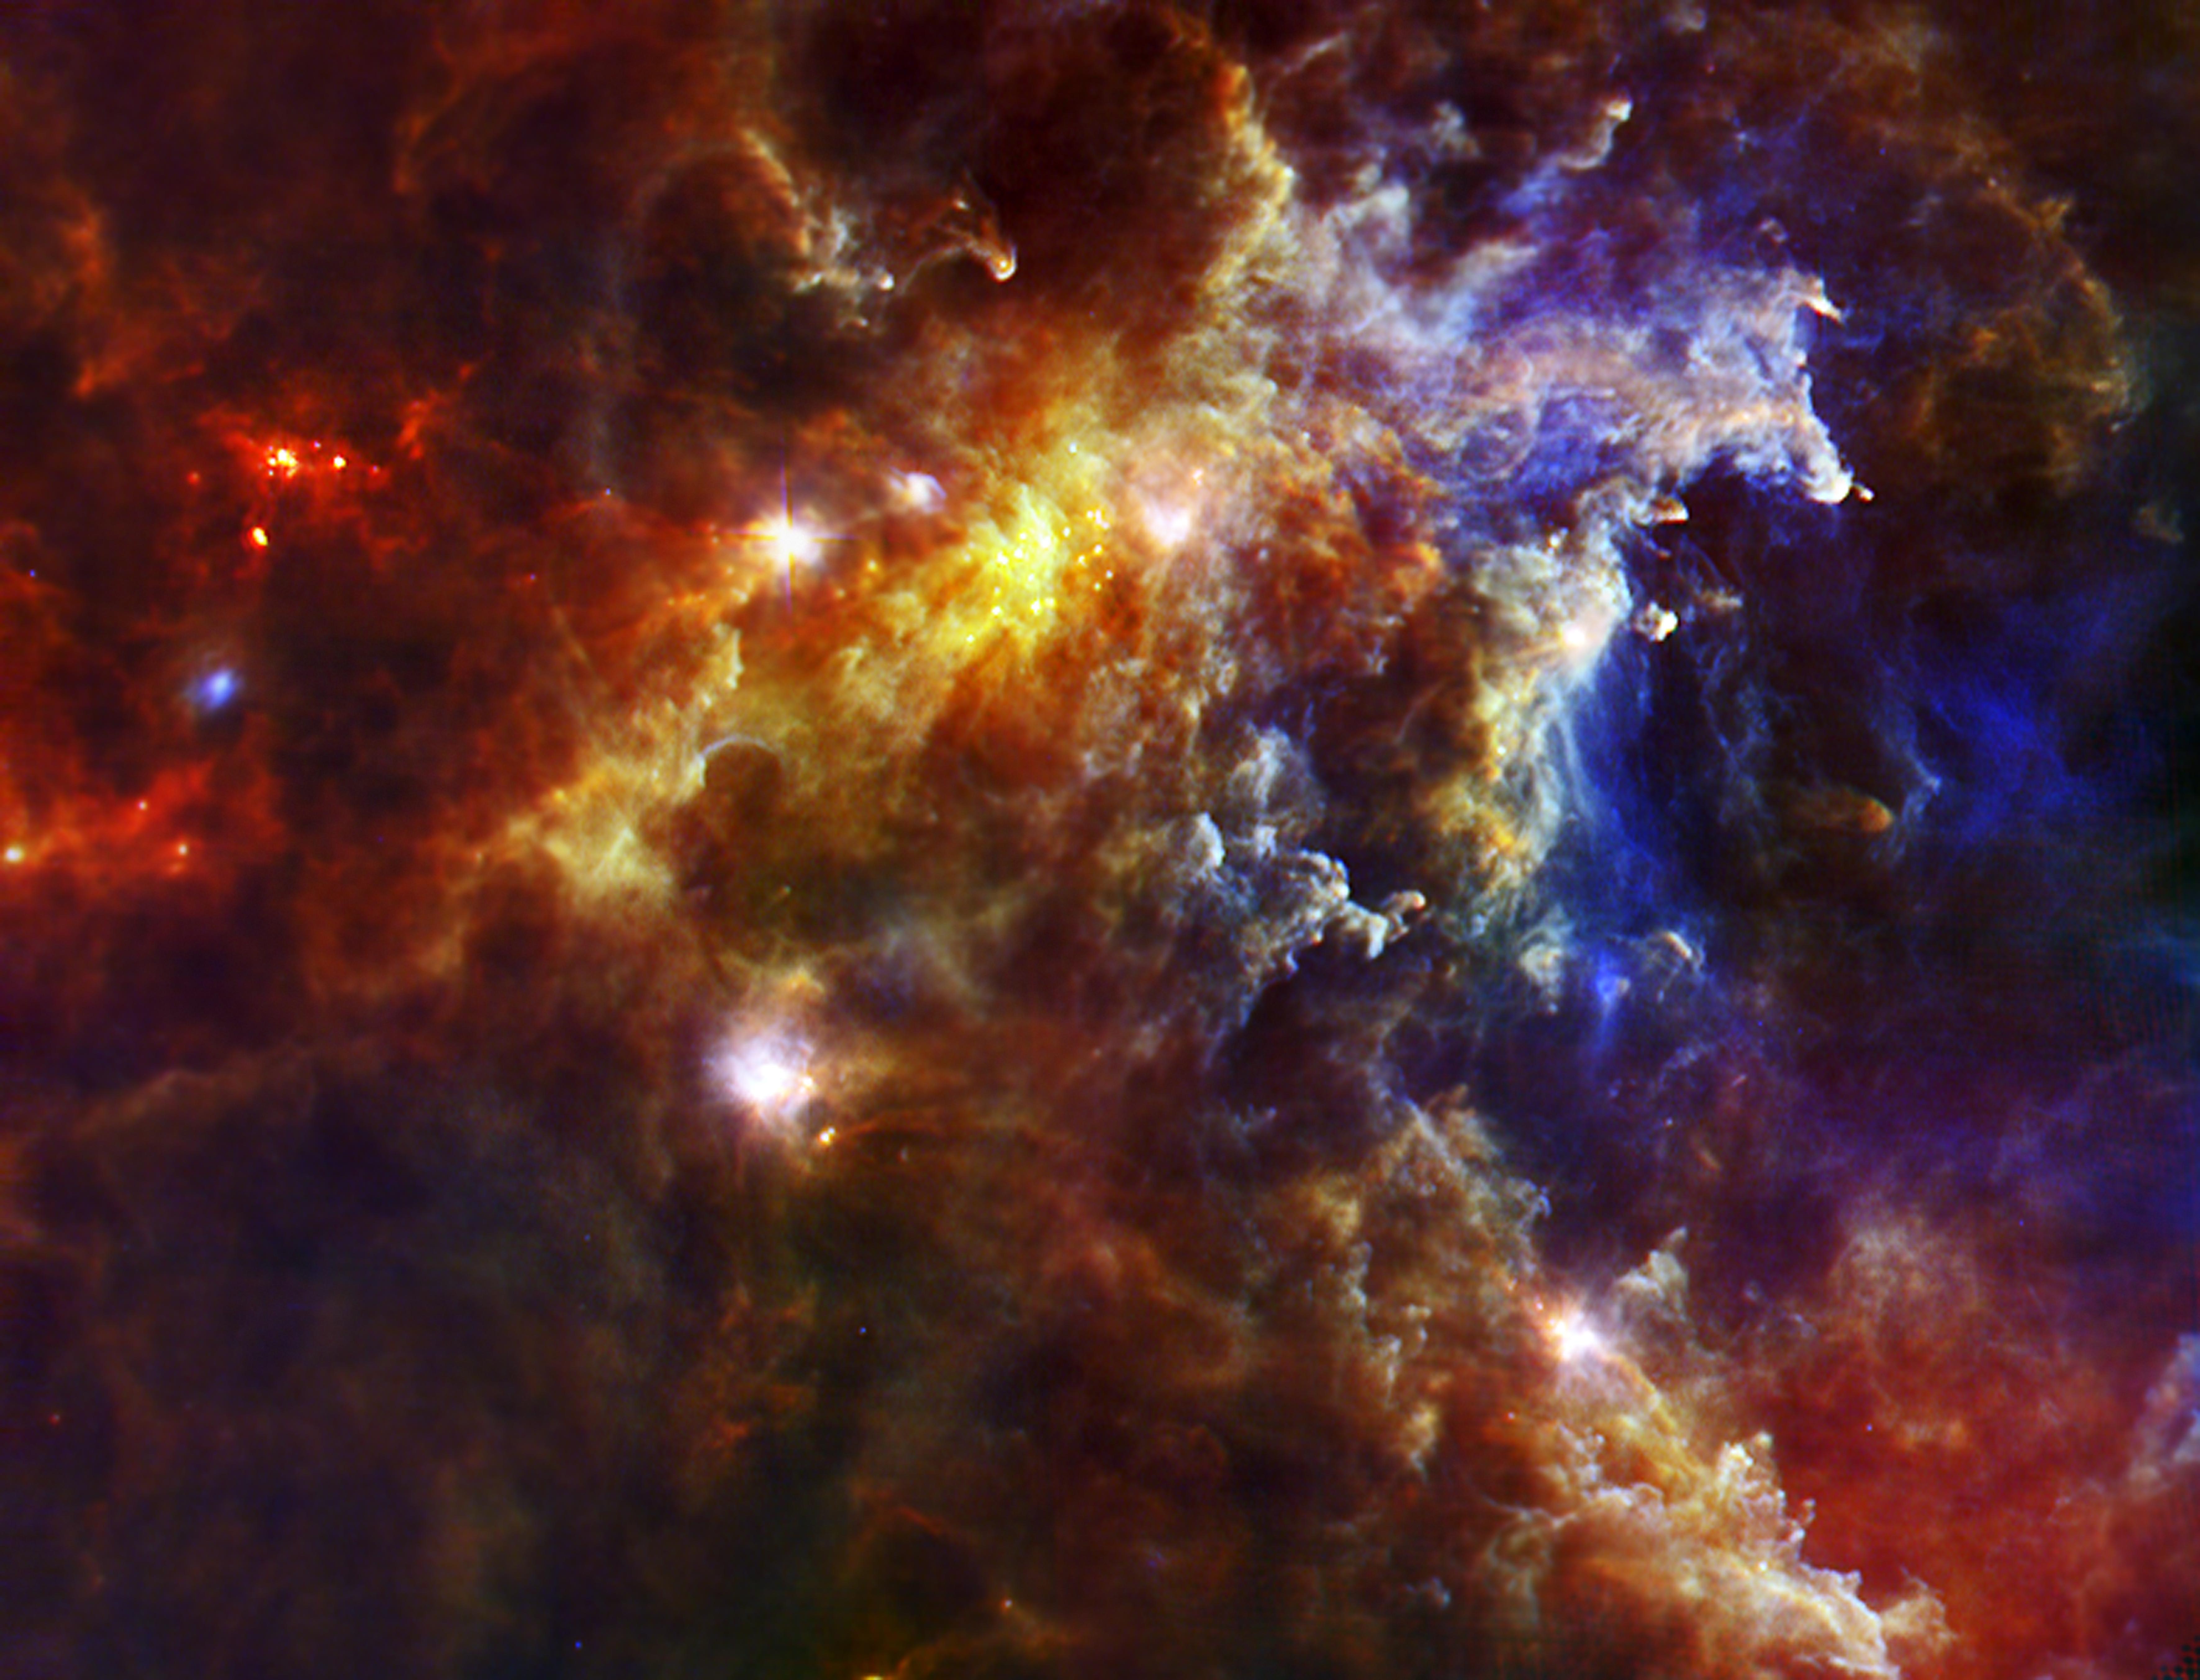 Stellar Nursery in the Rosette Nebula | NASA